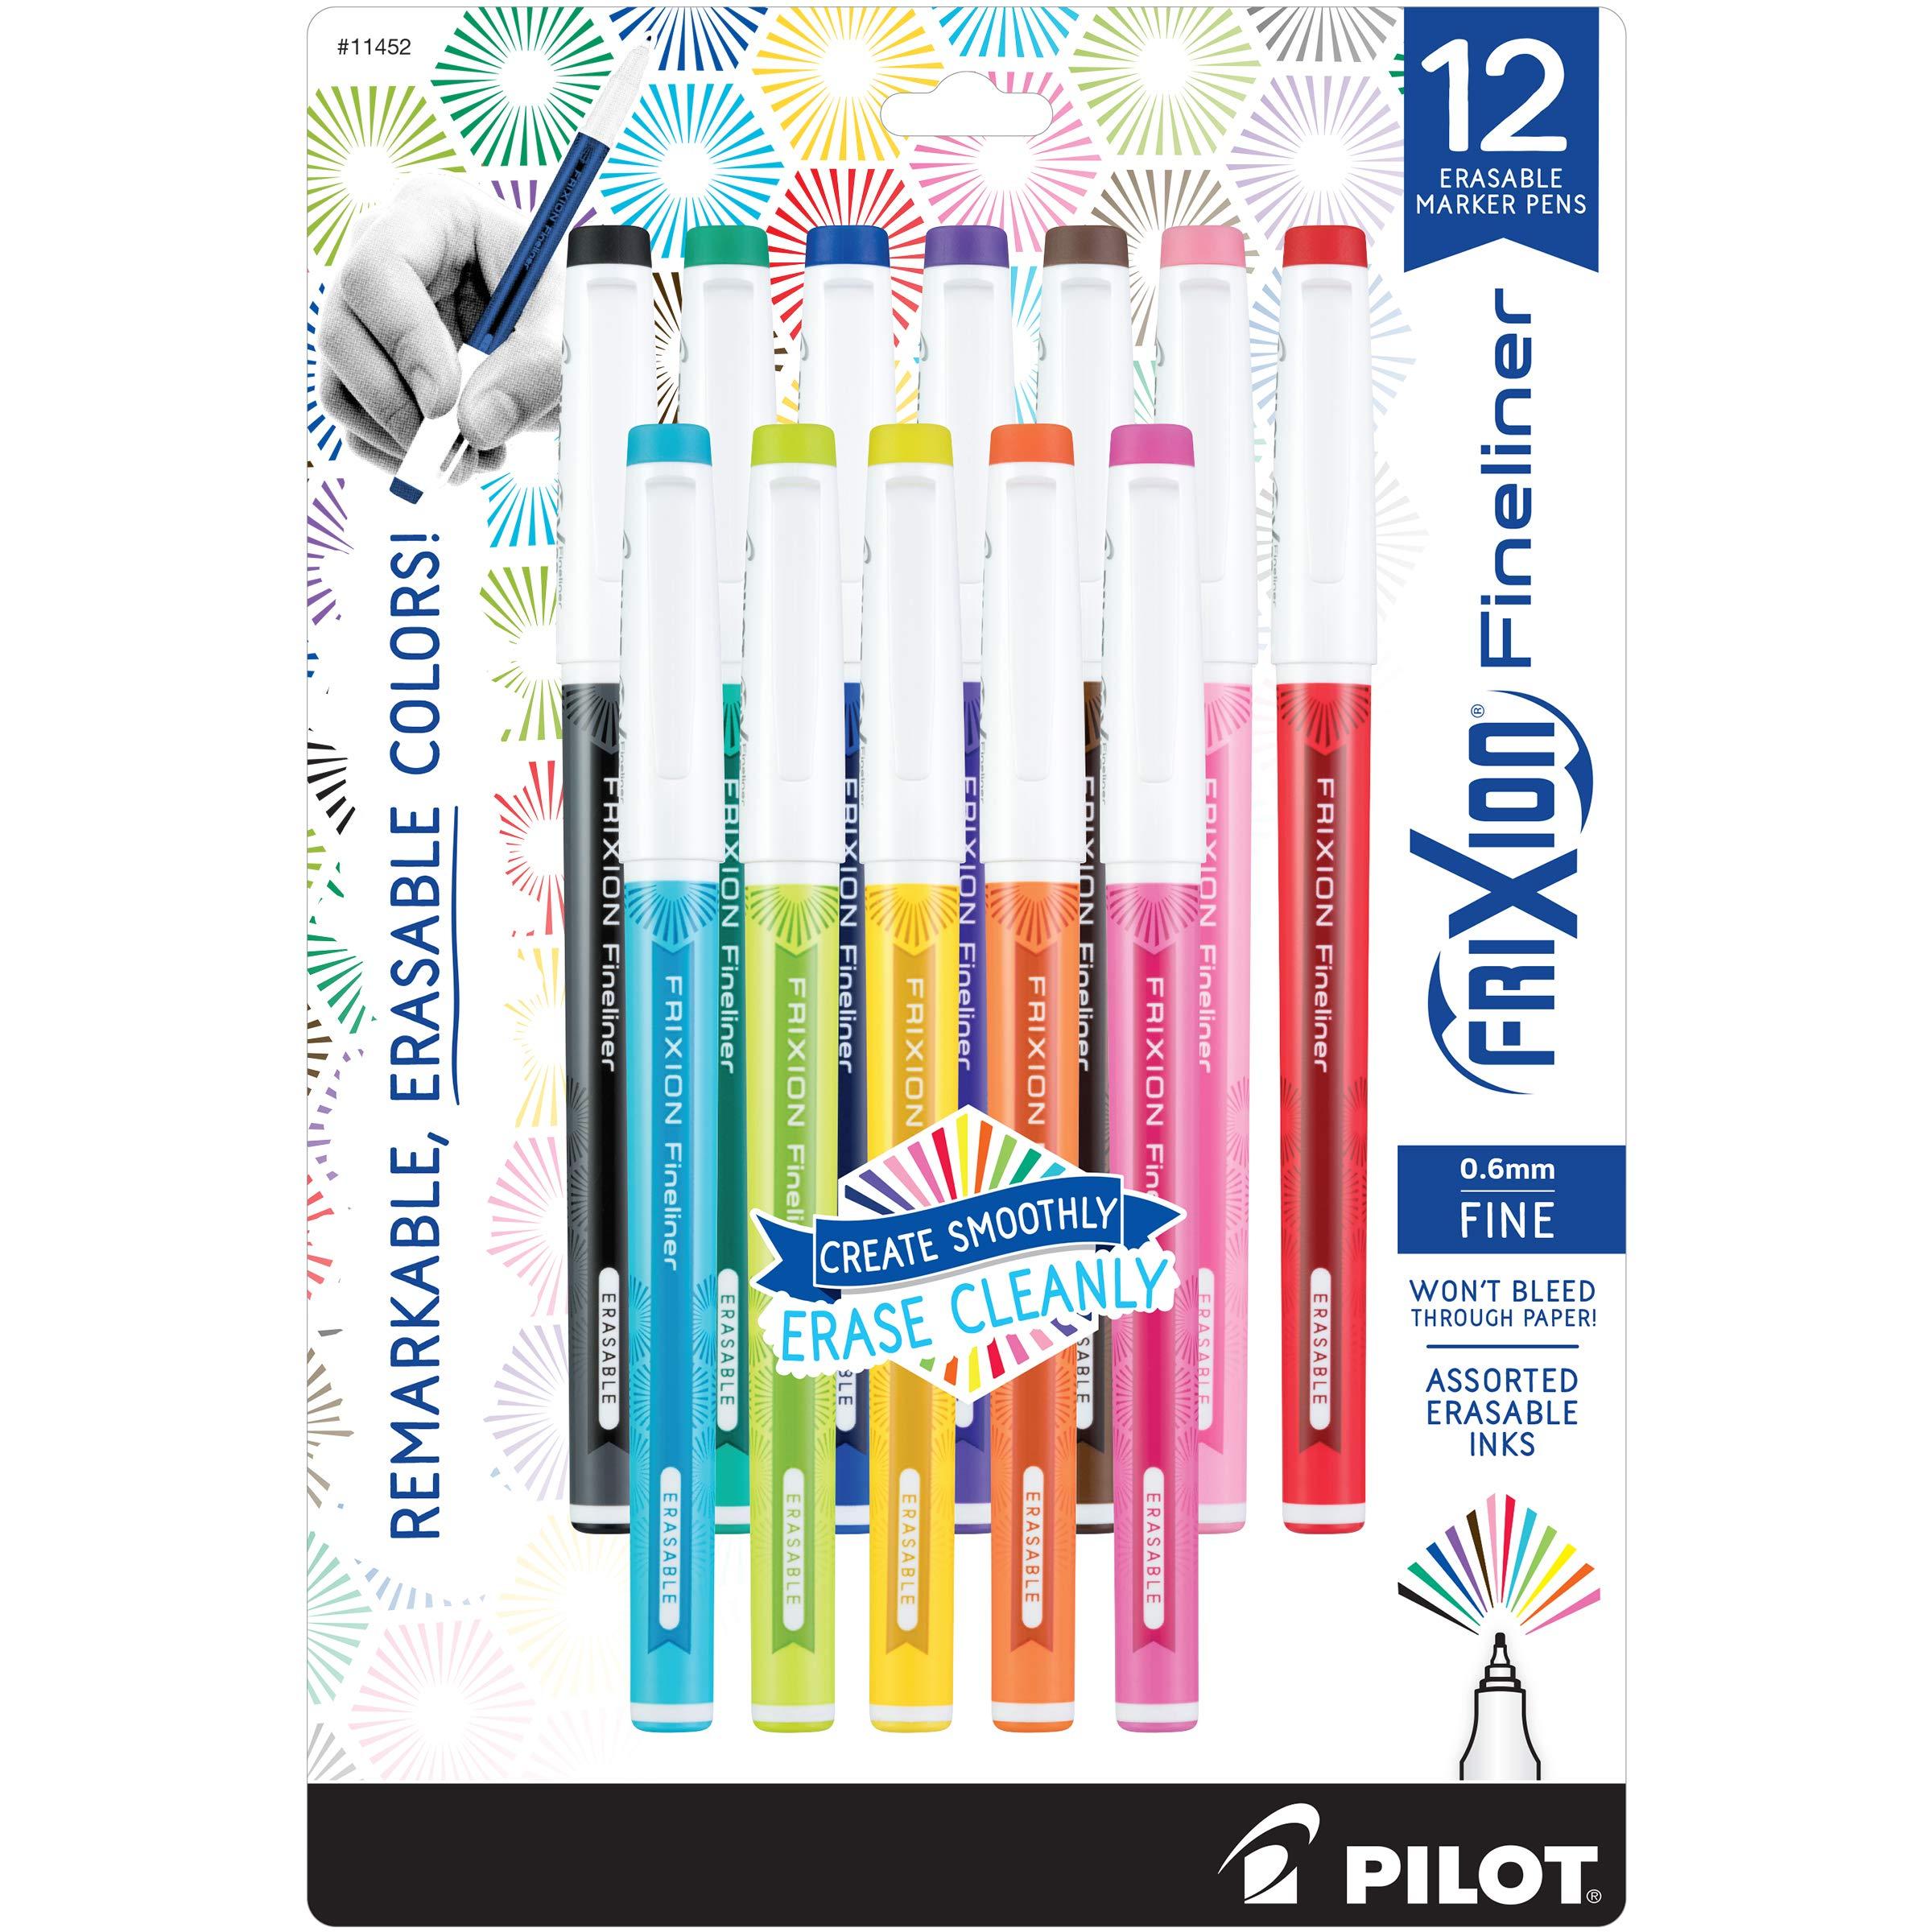 Pilot FriXion Fineliner Erasable Marker Pens, Fine Point, Assorted Color Inks, 12-Pack (11452) by Pilot